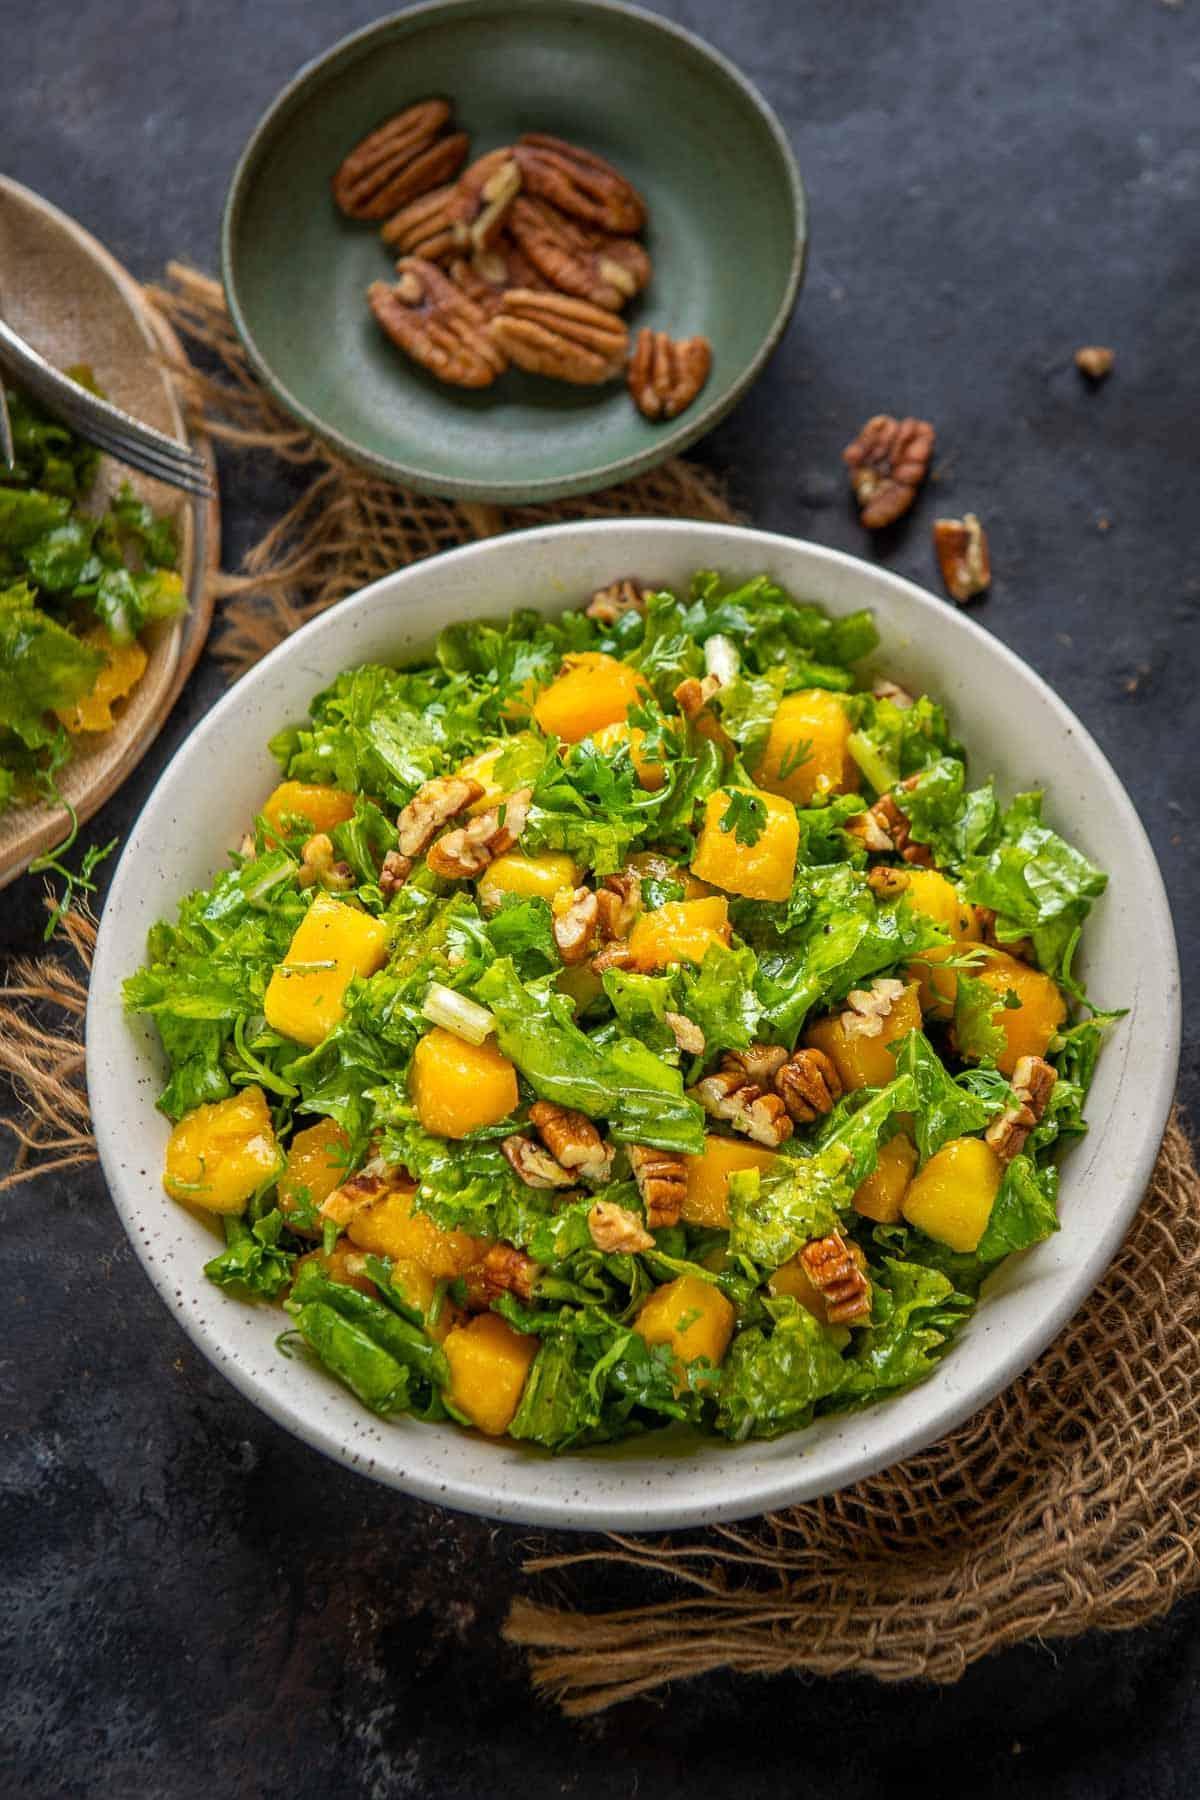 Kale mango salad served in a bowl.